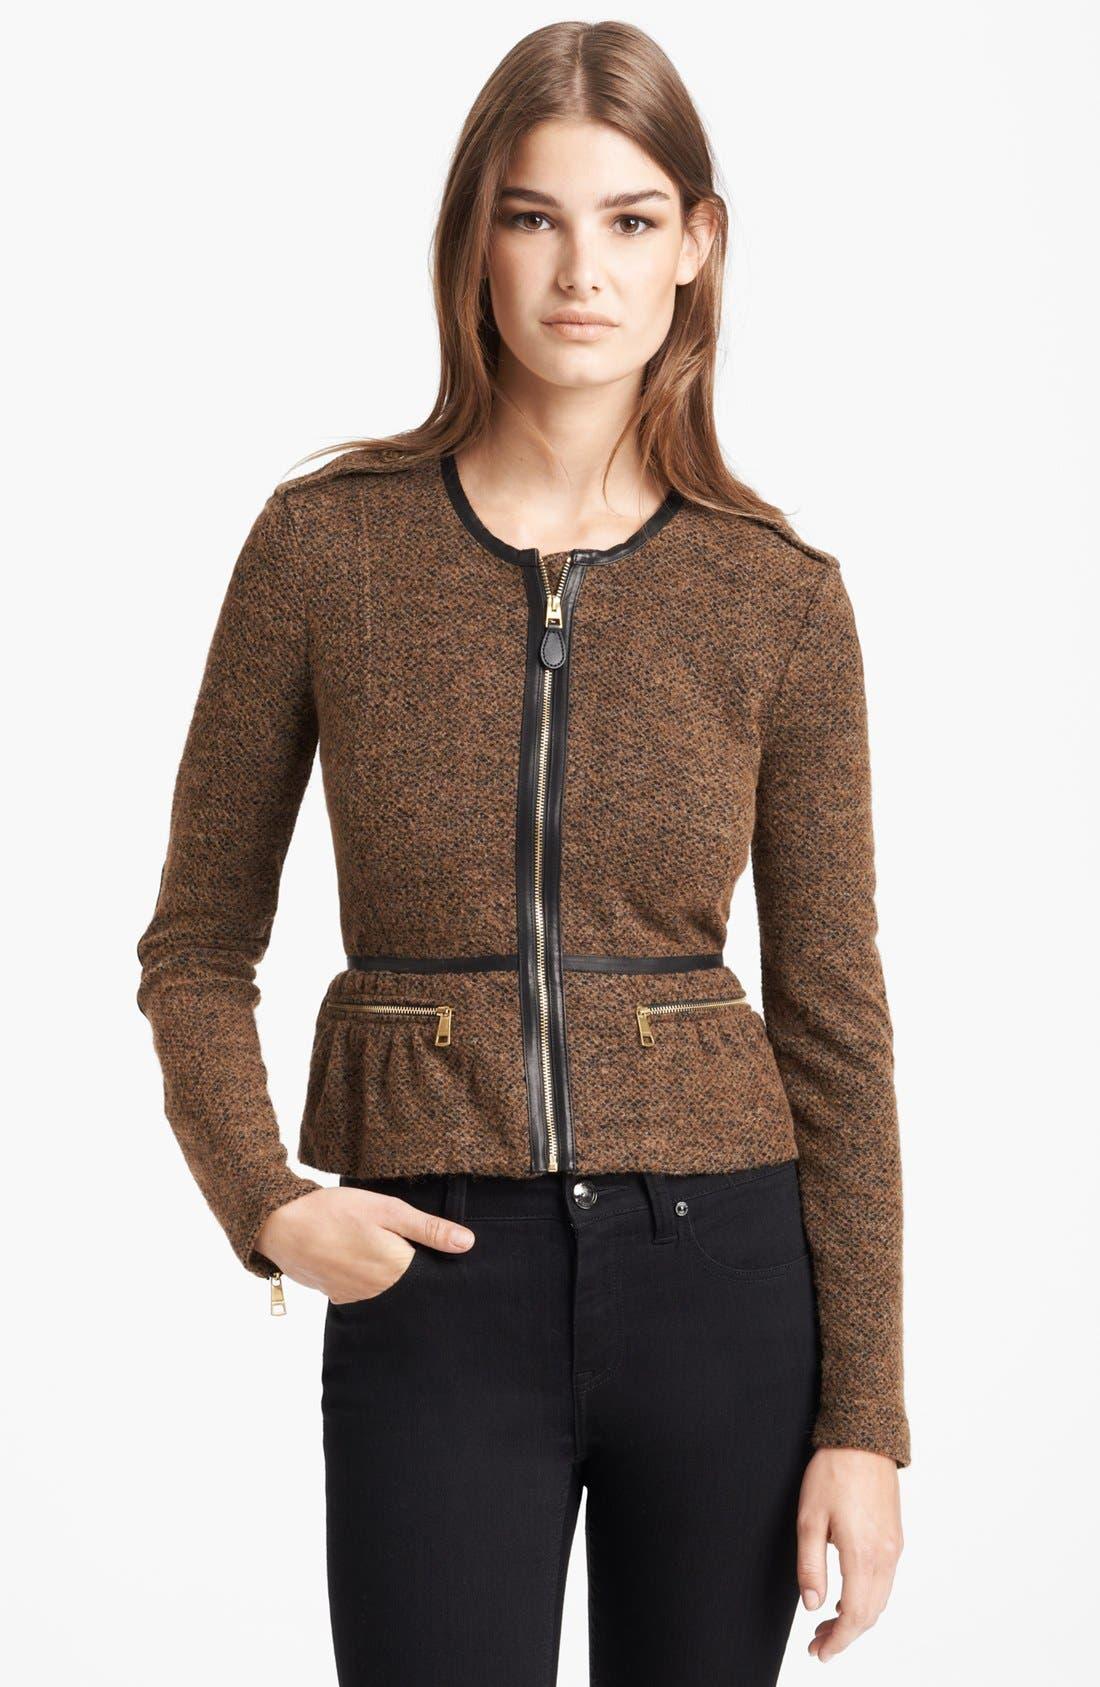 Main Image - Burberry Brit 'Meriden' Leather Trim Peplum Jacket